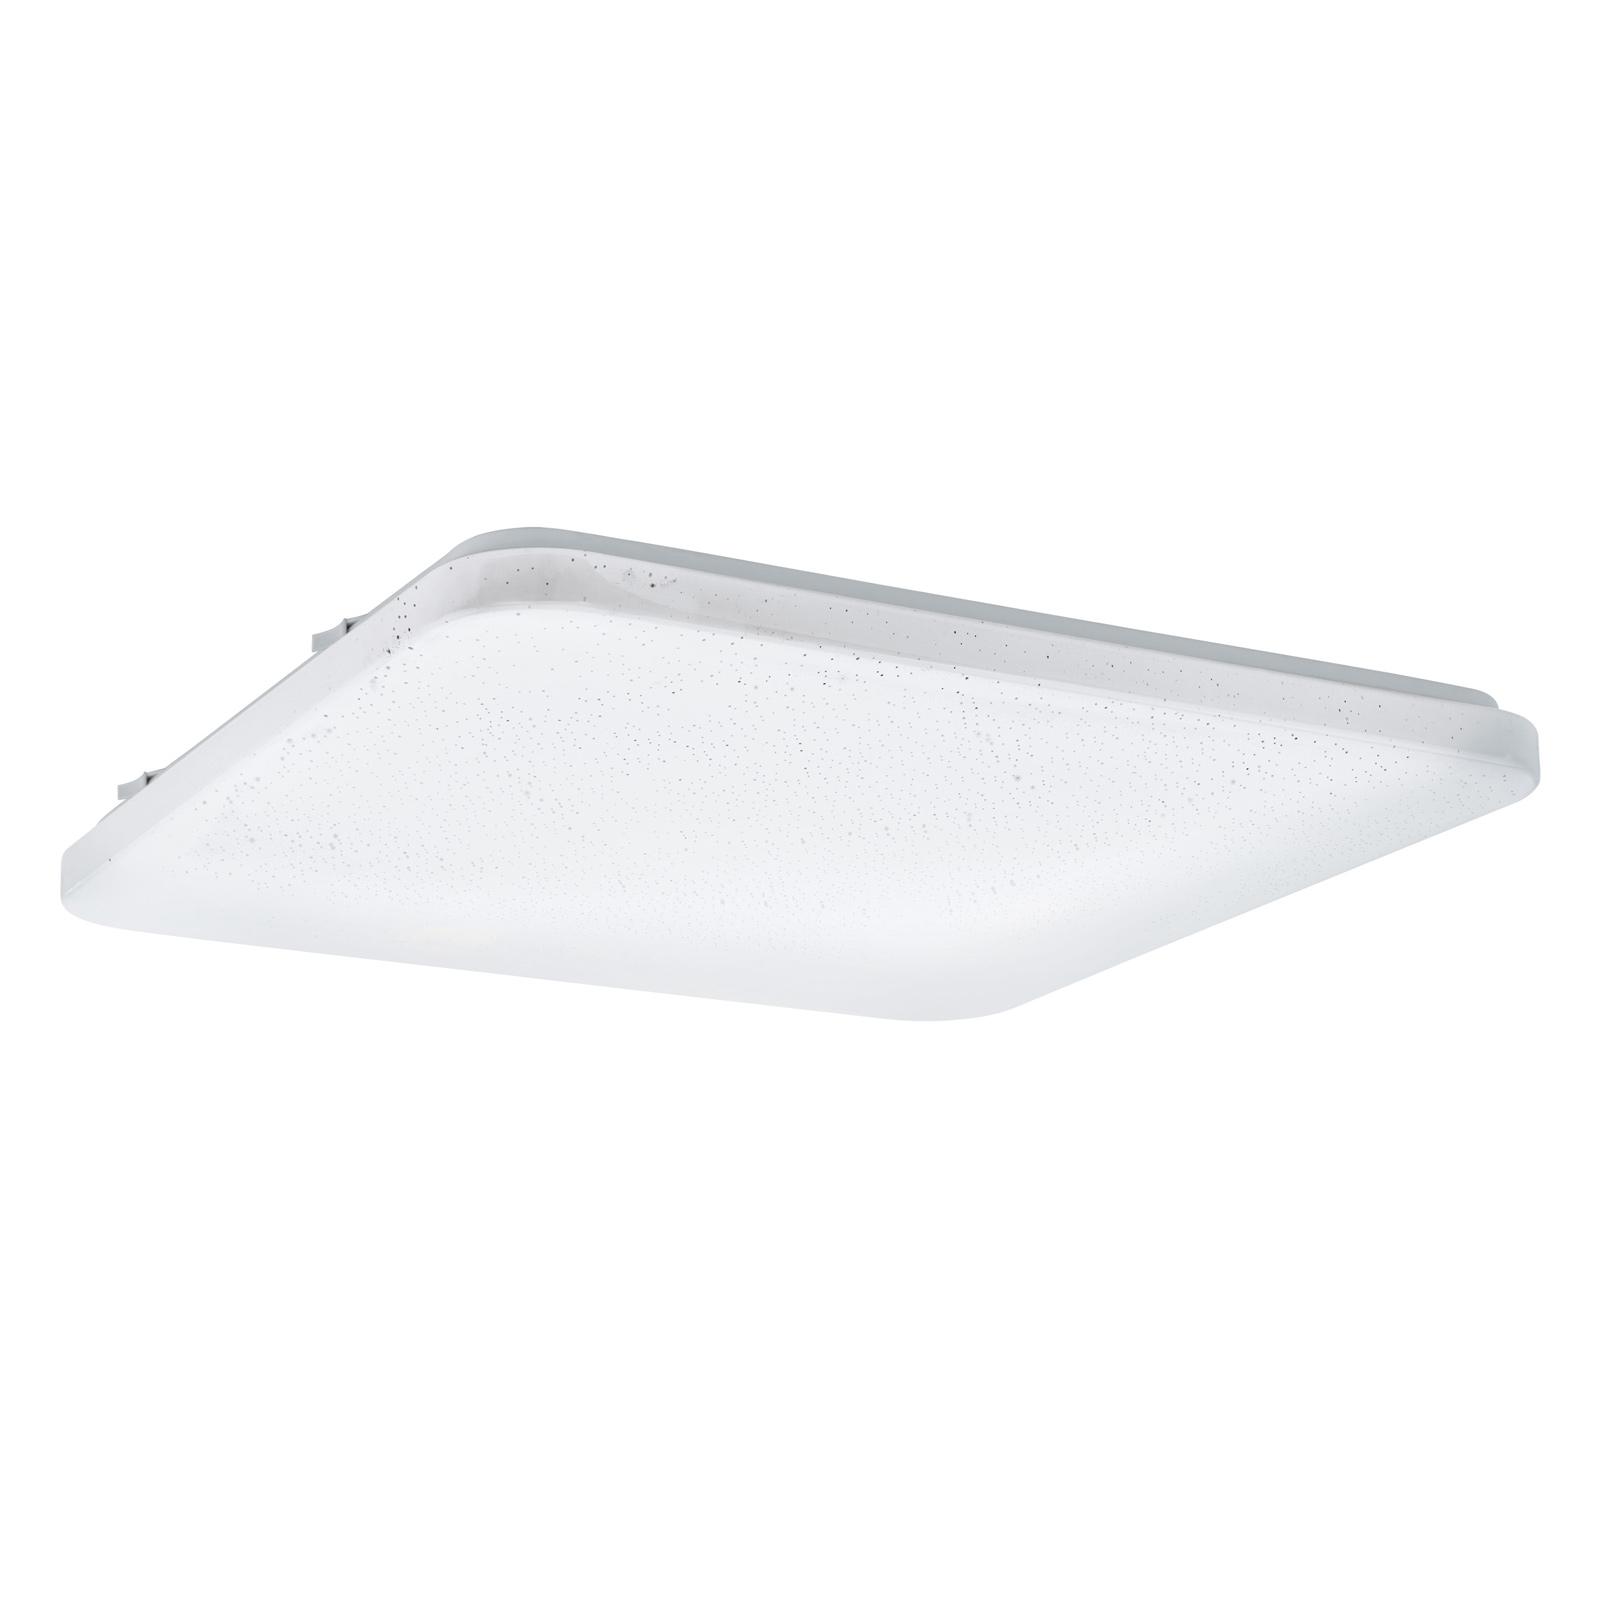 LED-Deckenlampe Frania mit Kistalleffekt, eckig